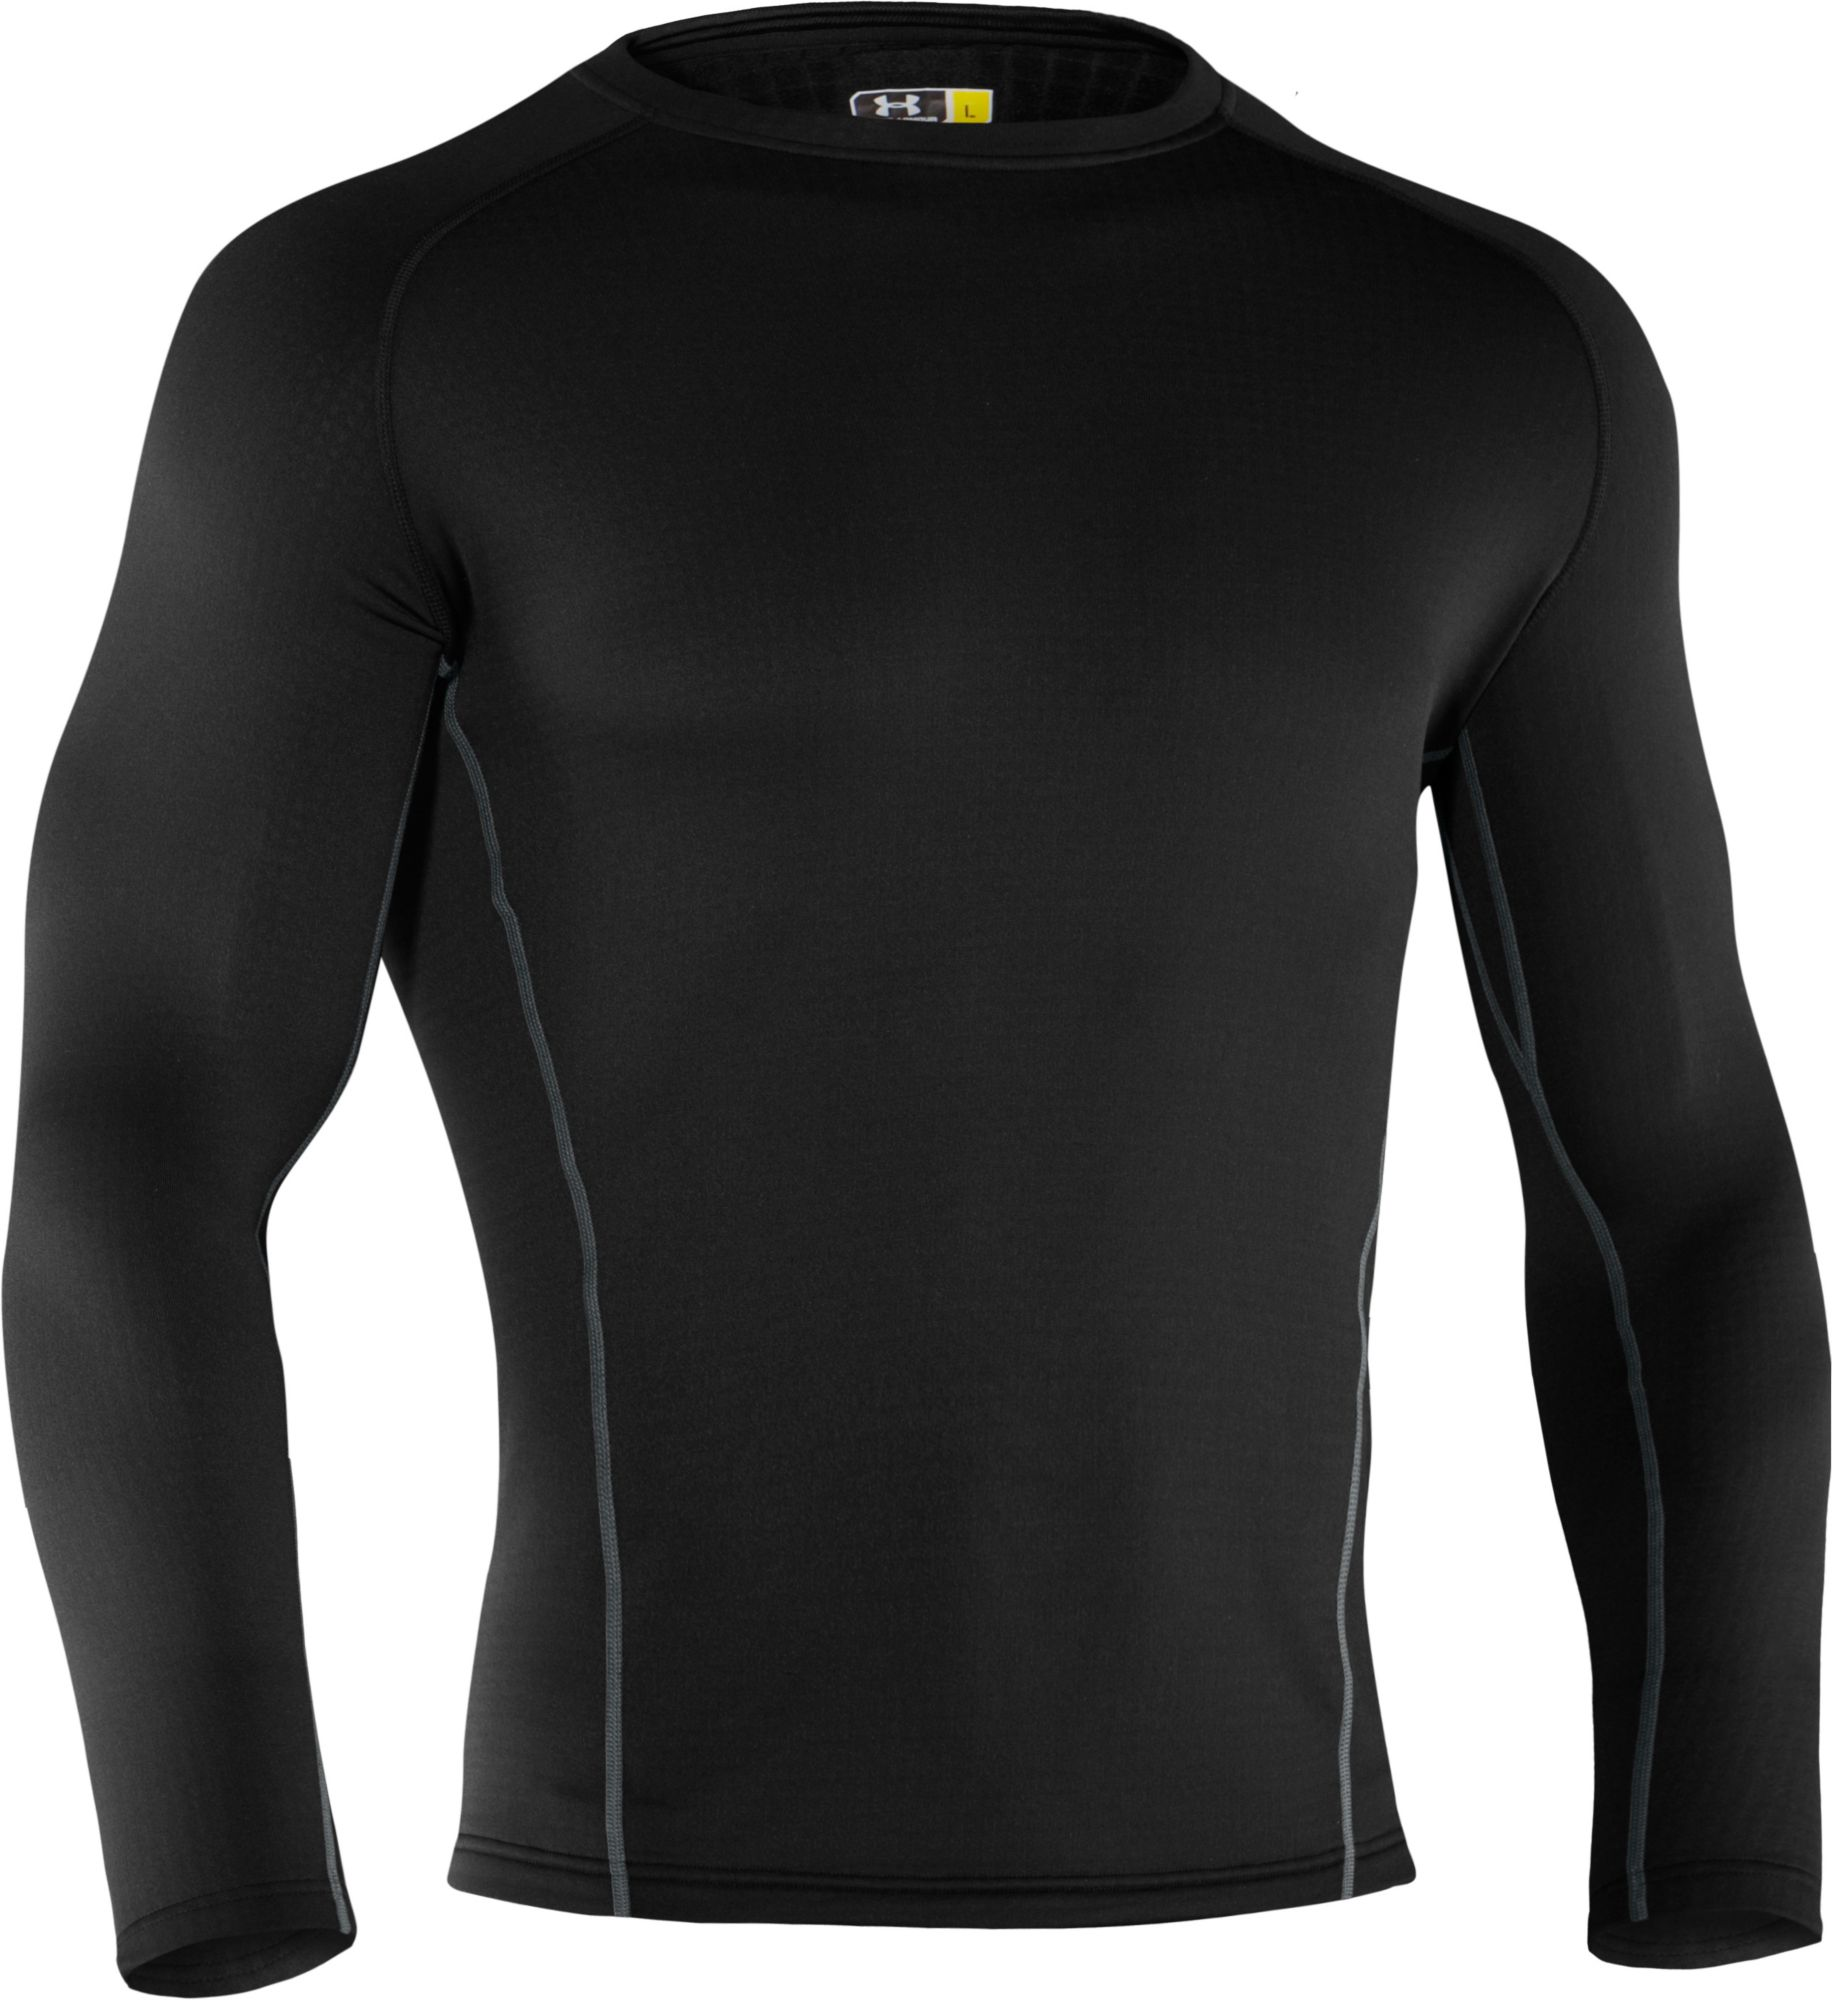 Men's Thermal Underwear | DICK'S Sporting Goods